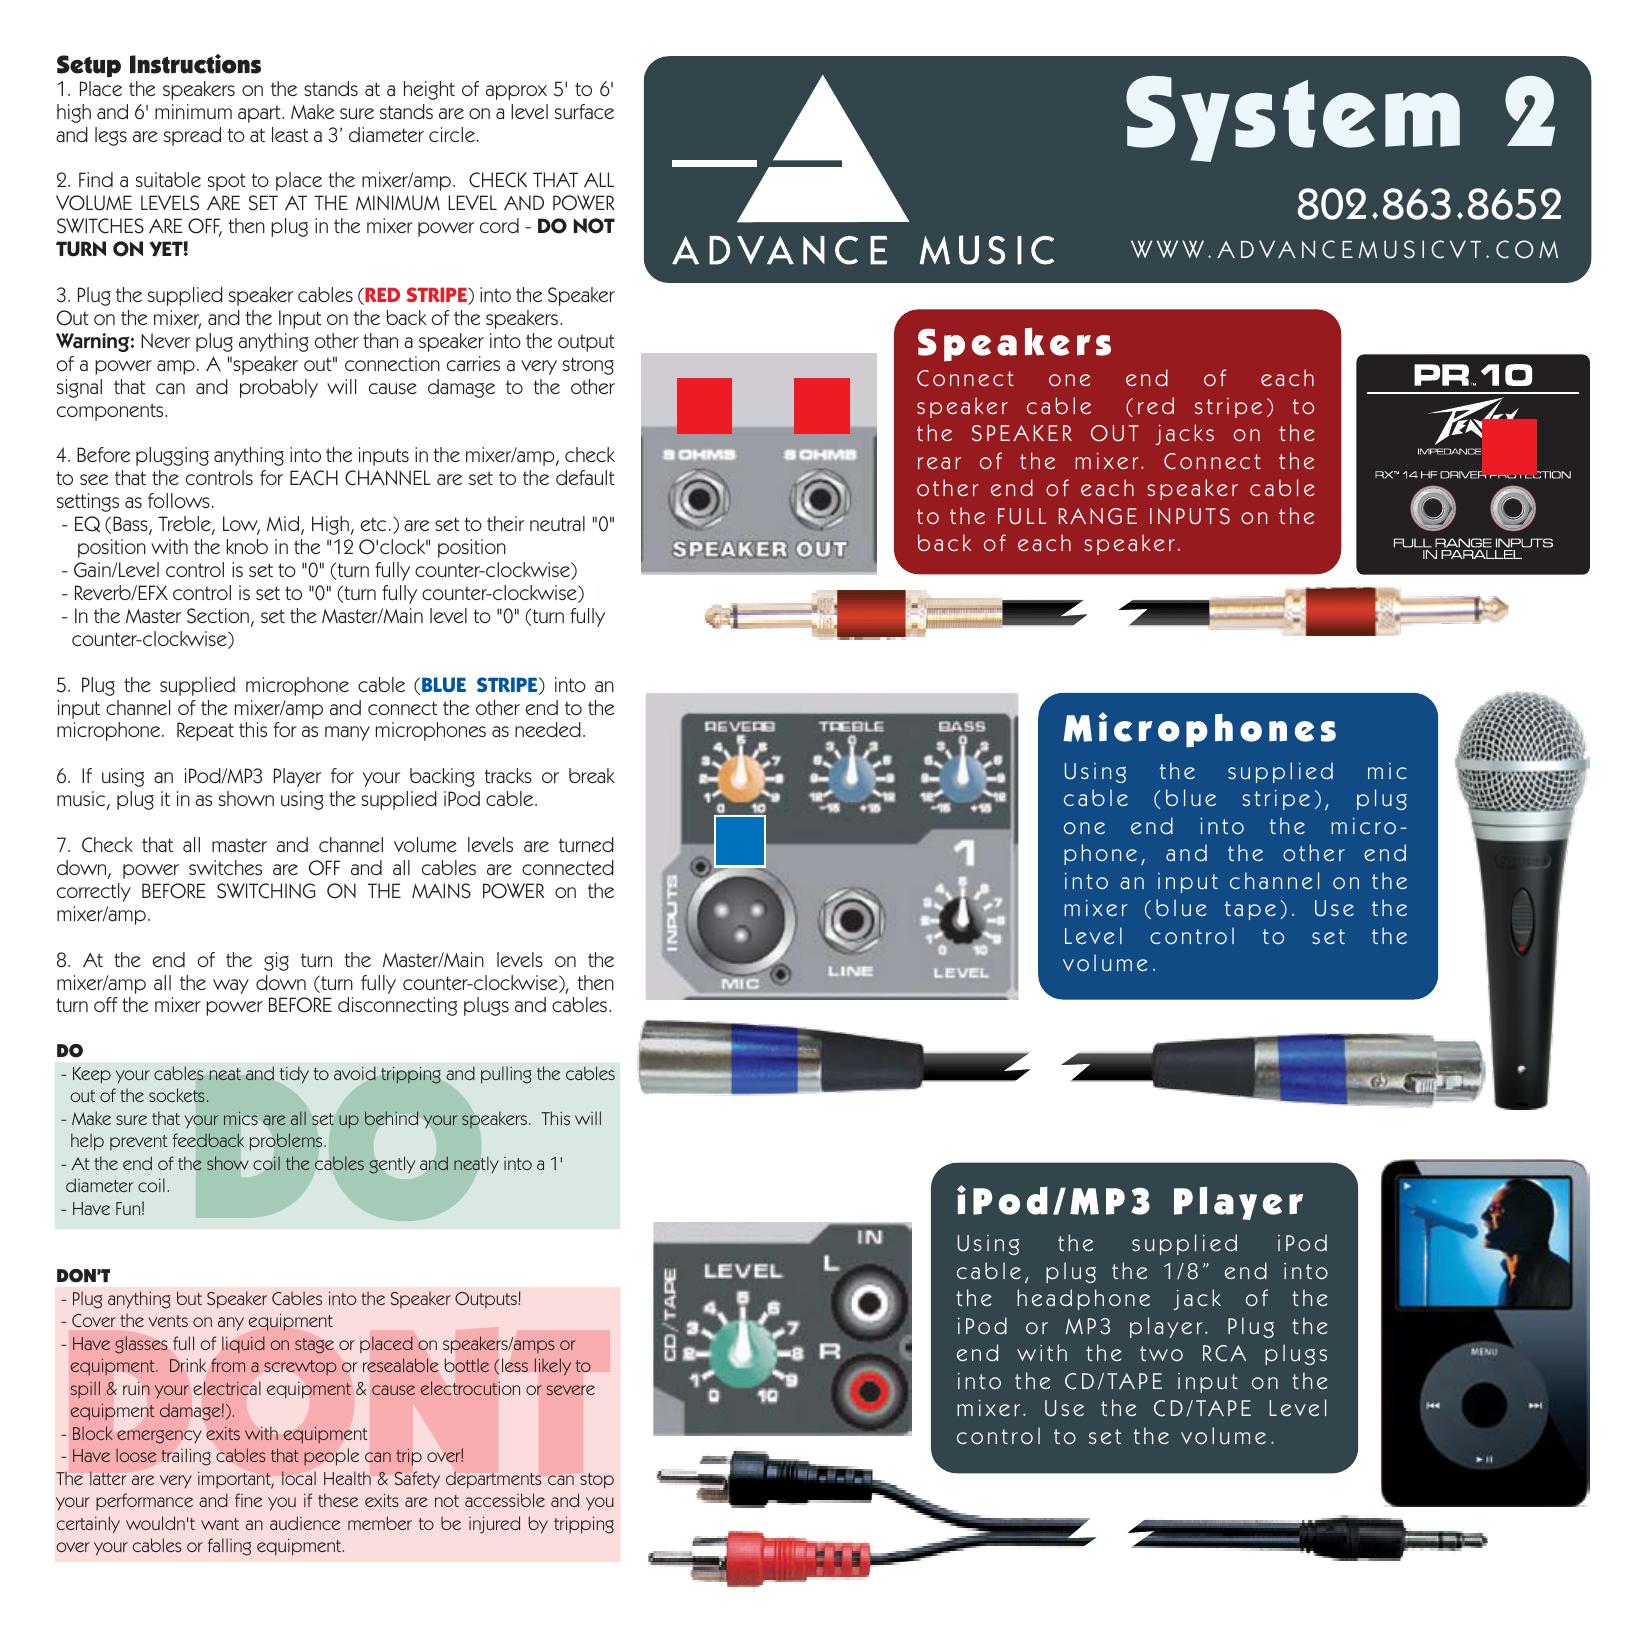 System 2 - Advance Music   manualzz com